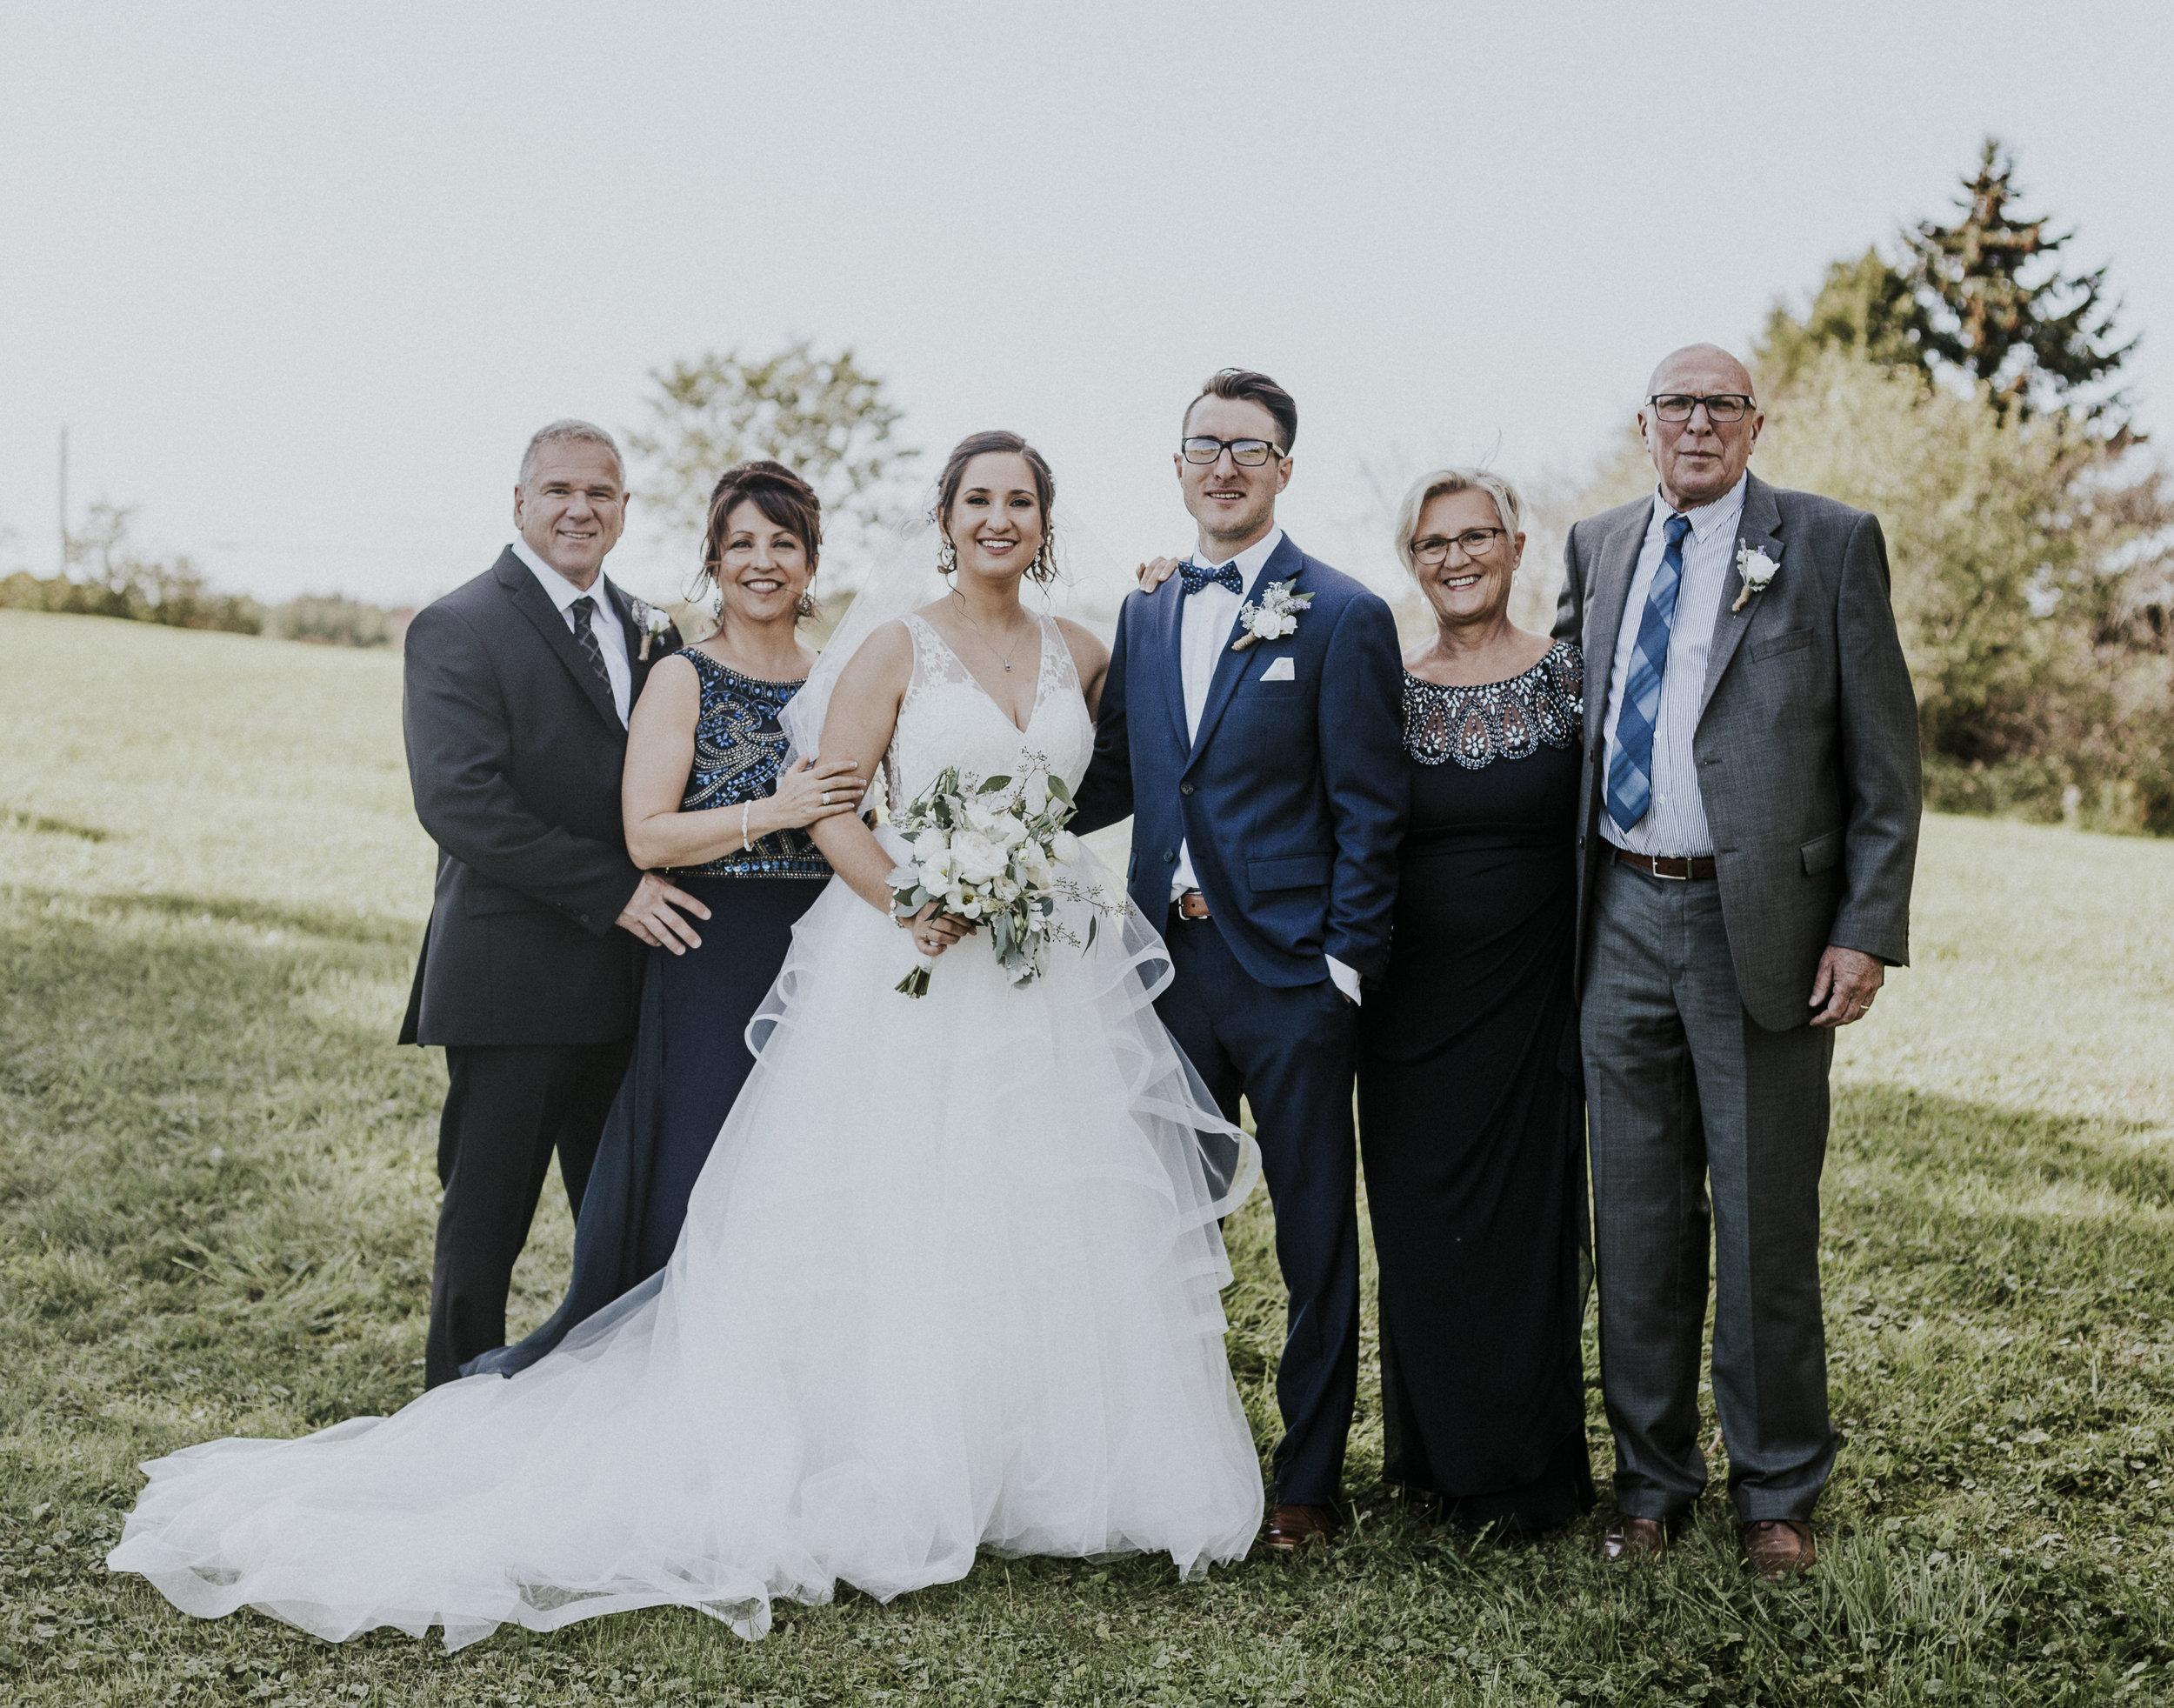 FORMALS + WEDDING PARTY-006.jpg